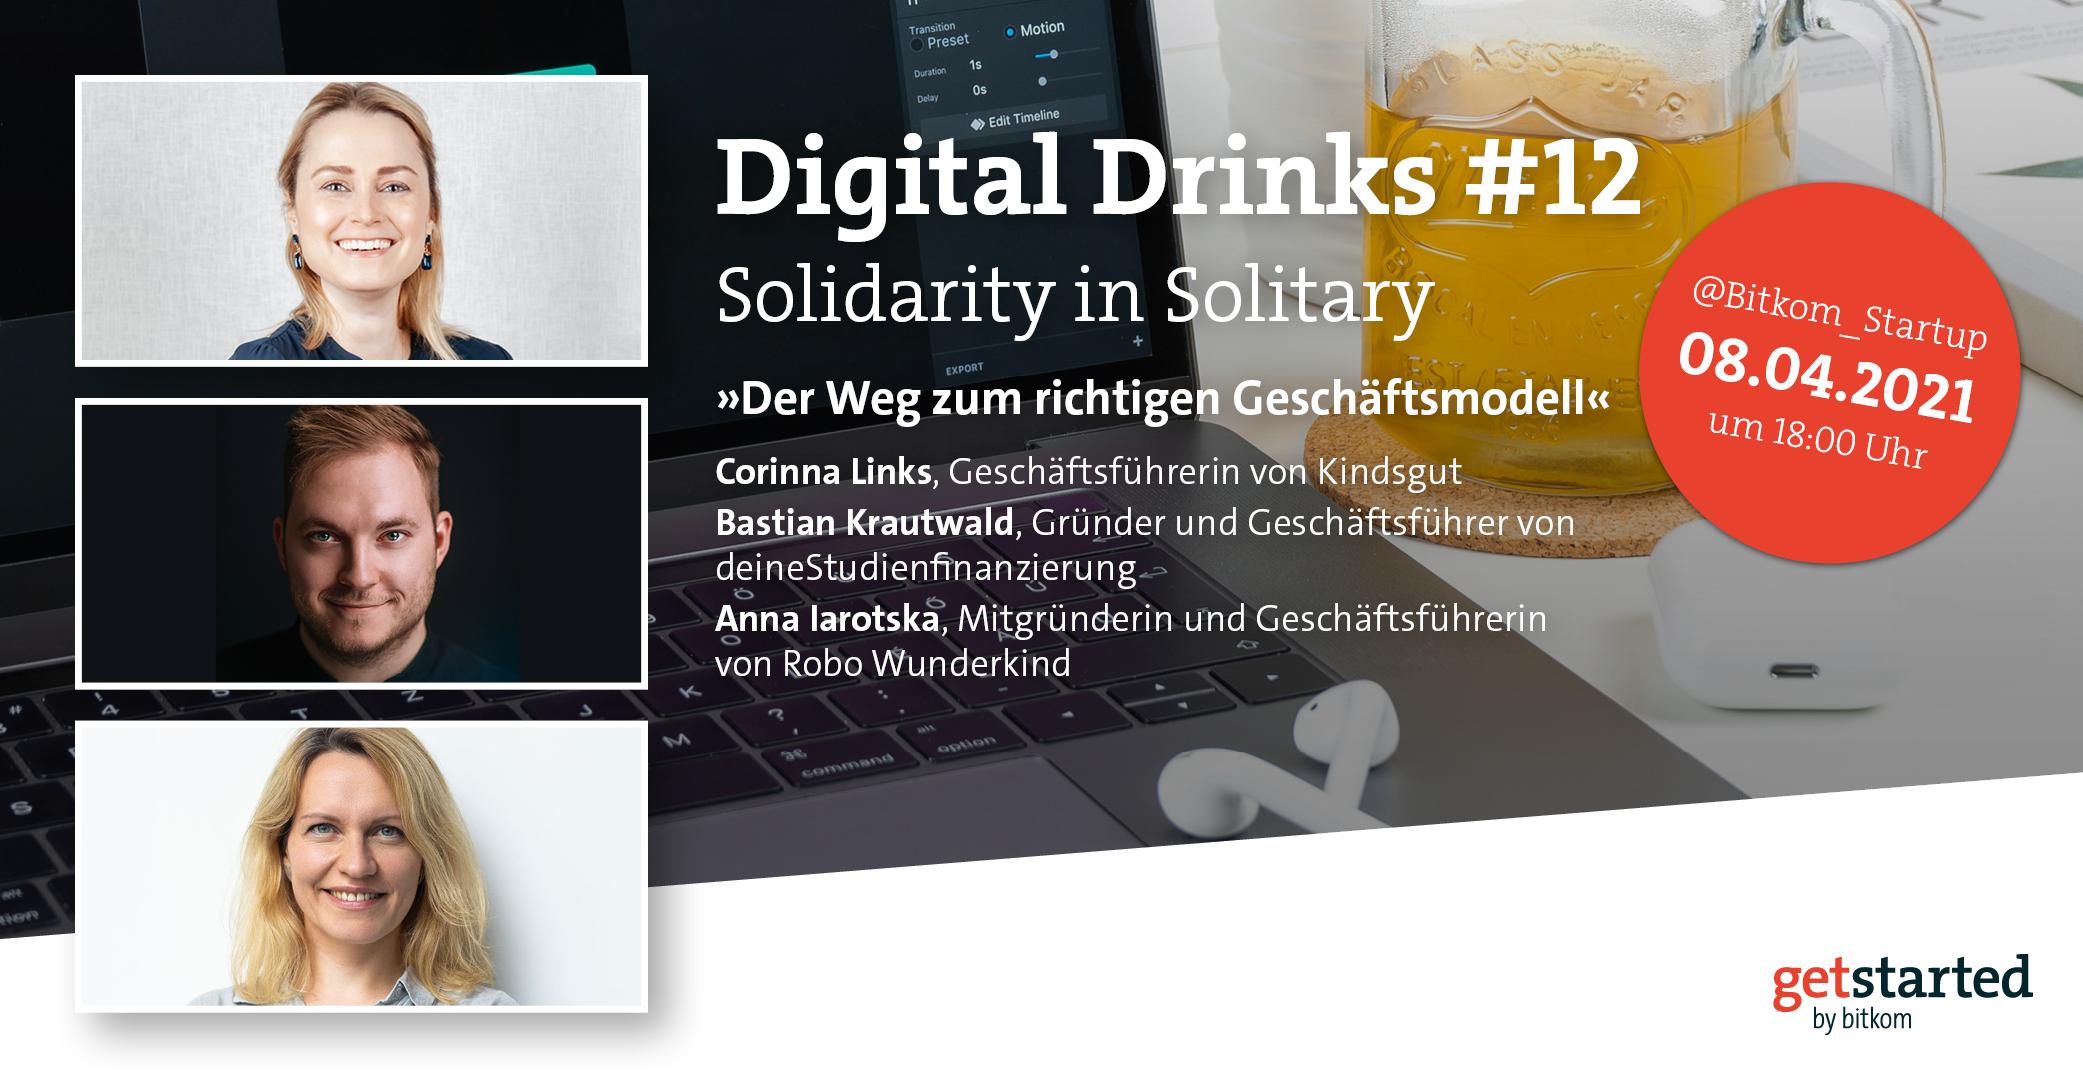 Digital Drinks #12